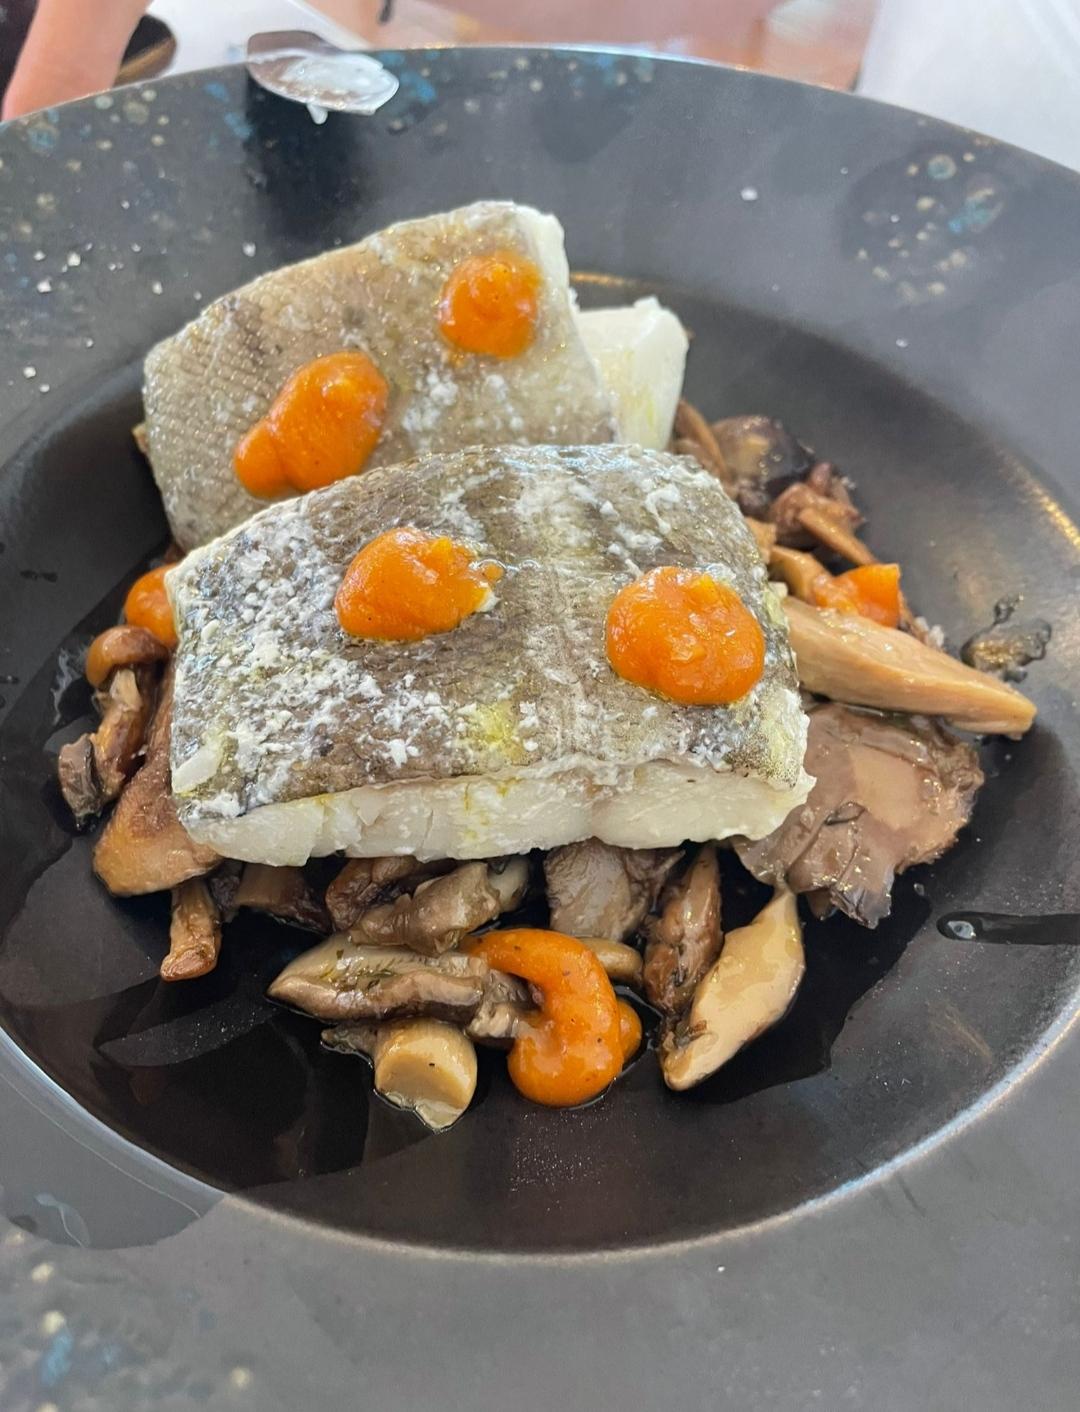 Reseñas gastronómicas: Restaurante Bon Vent 7